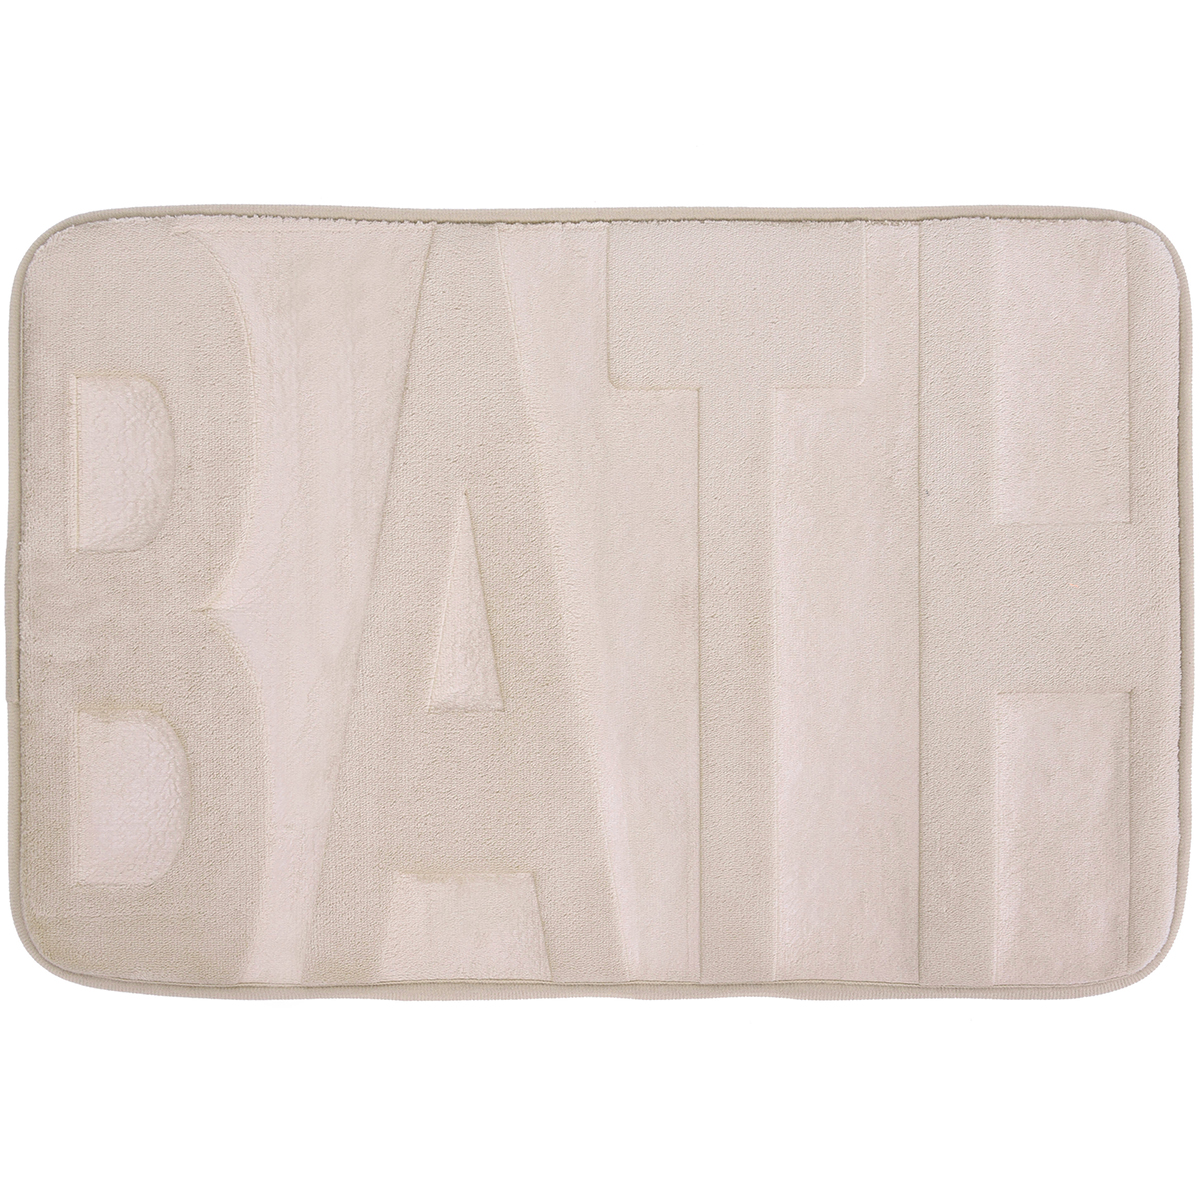 Basic килимче за баня Bath Беж 40х60